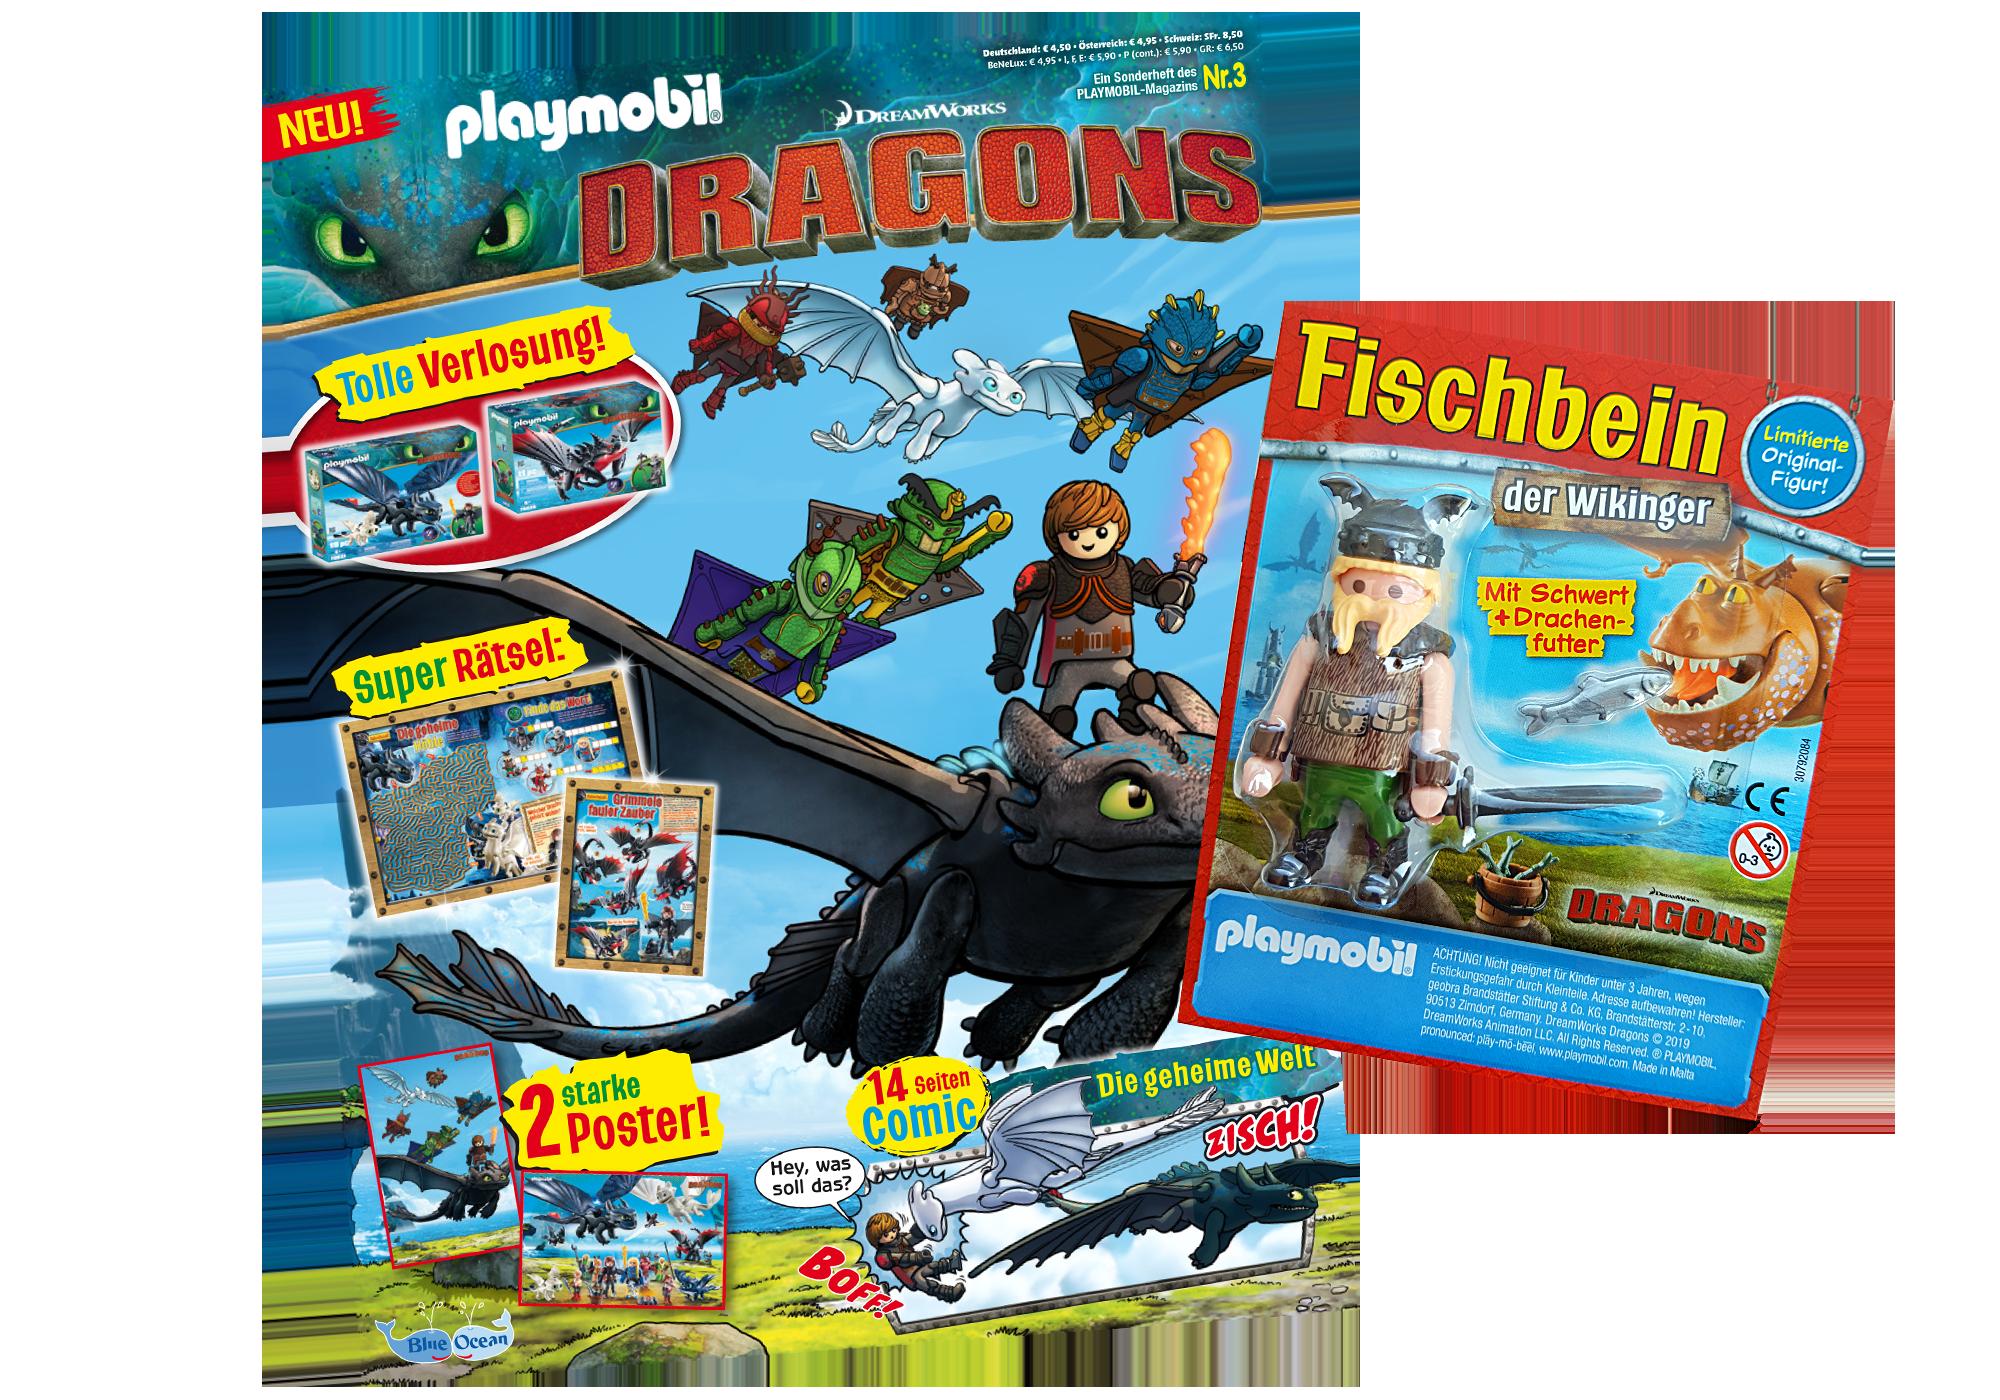 http://media.playmobil.com/i/playmobil/80623_product_detail/PLAYMOBIL-Magazin Sonderausgabe Dragons 2019